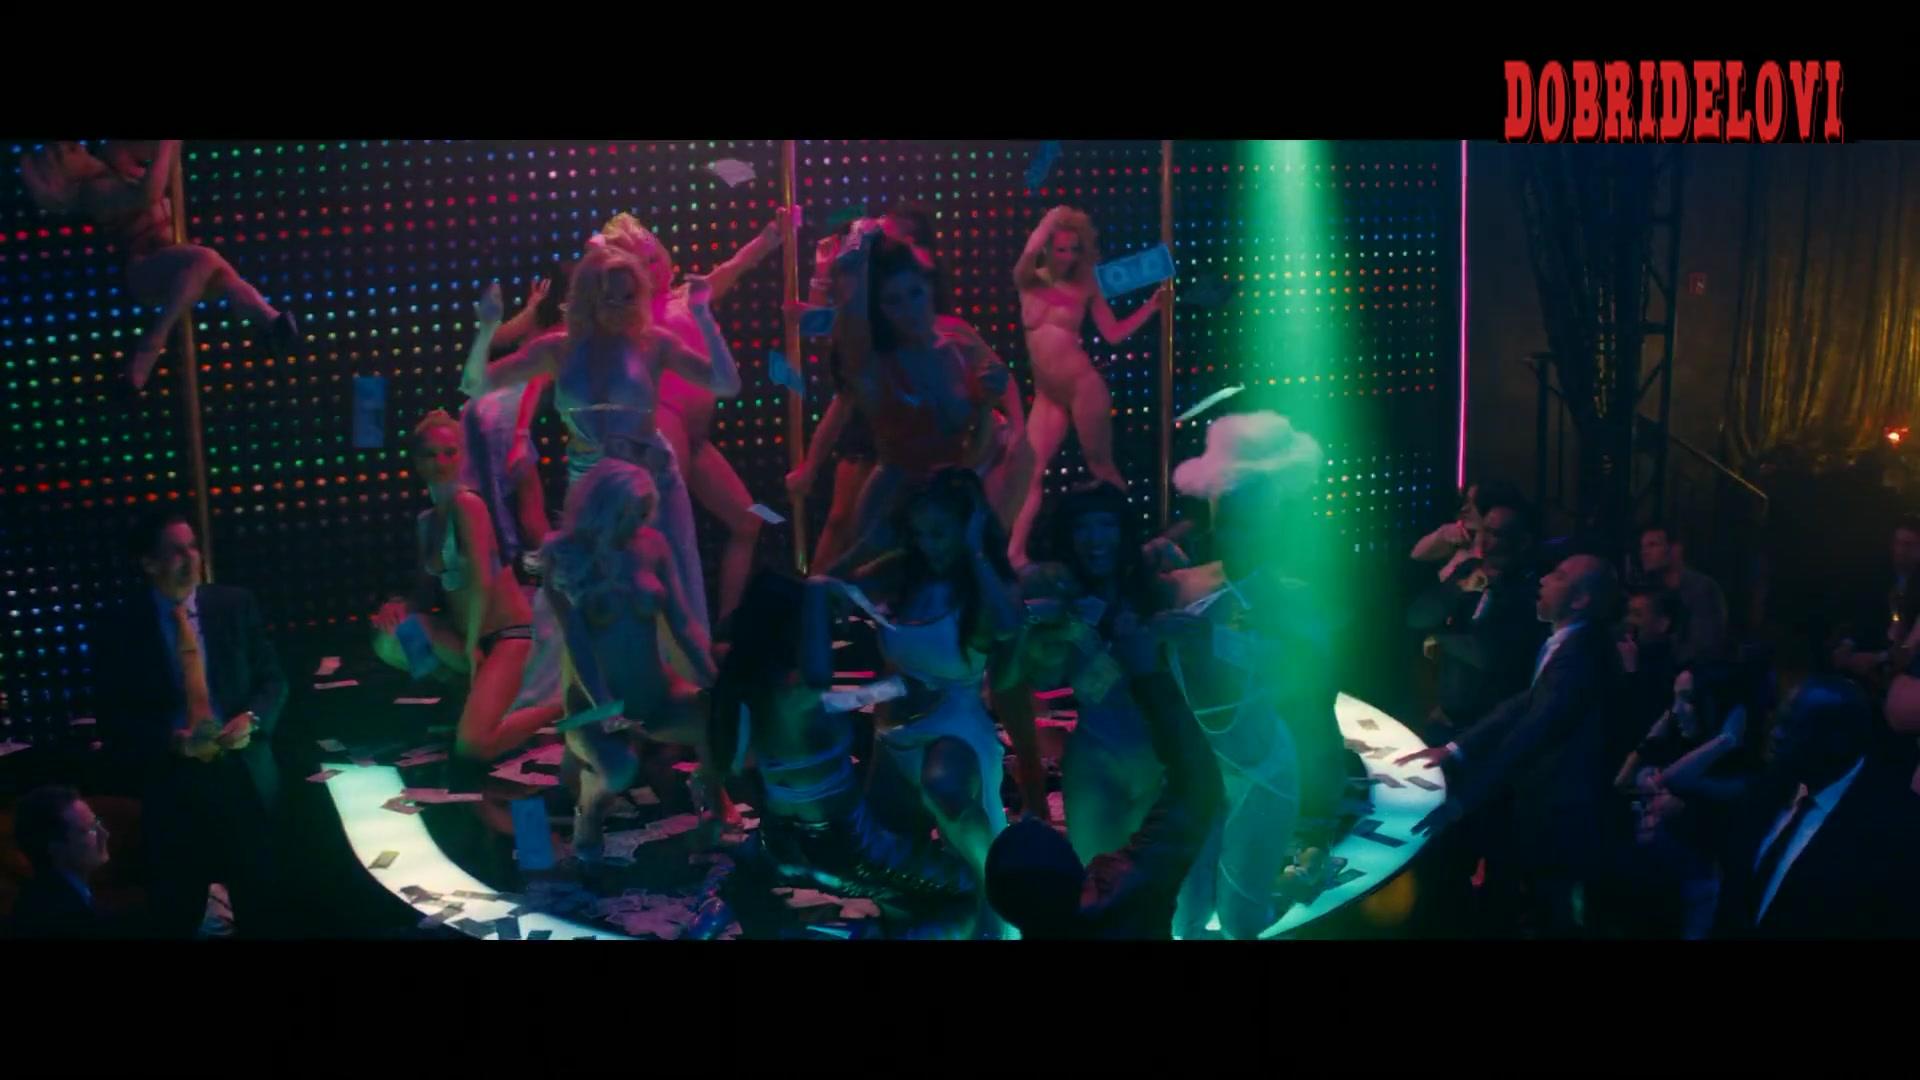 Jennifer Lopez and stripper friends put on a show in Husterls